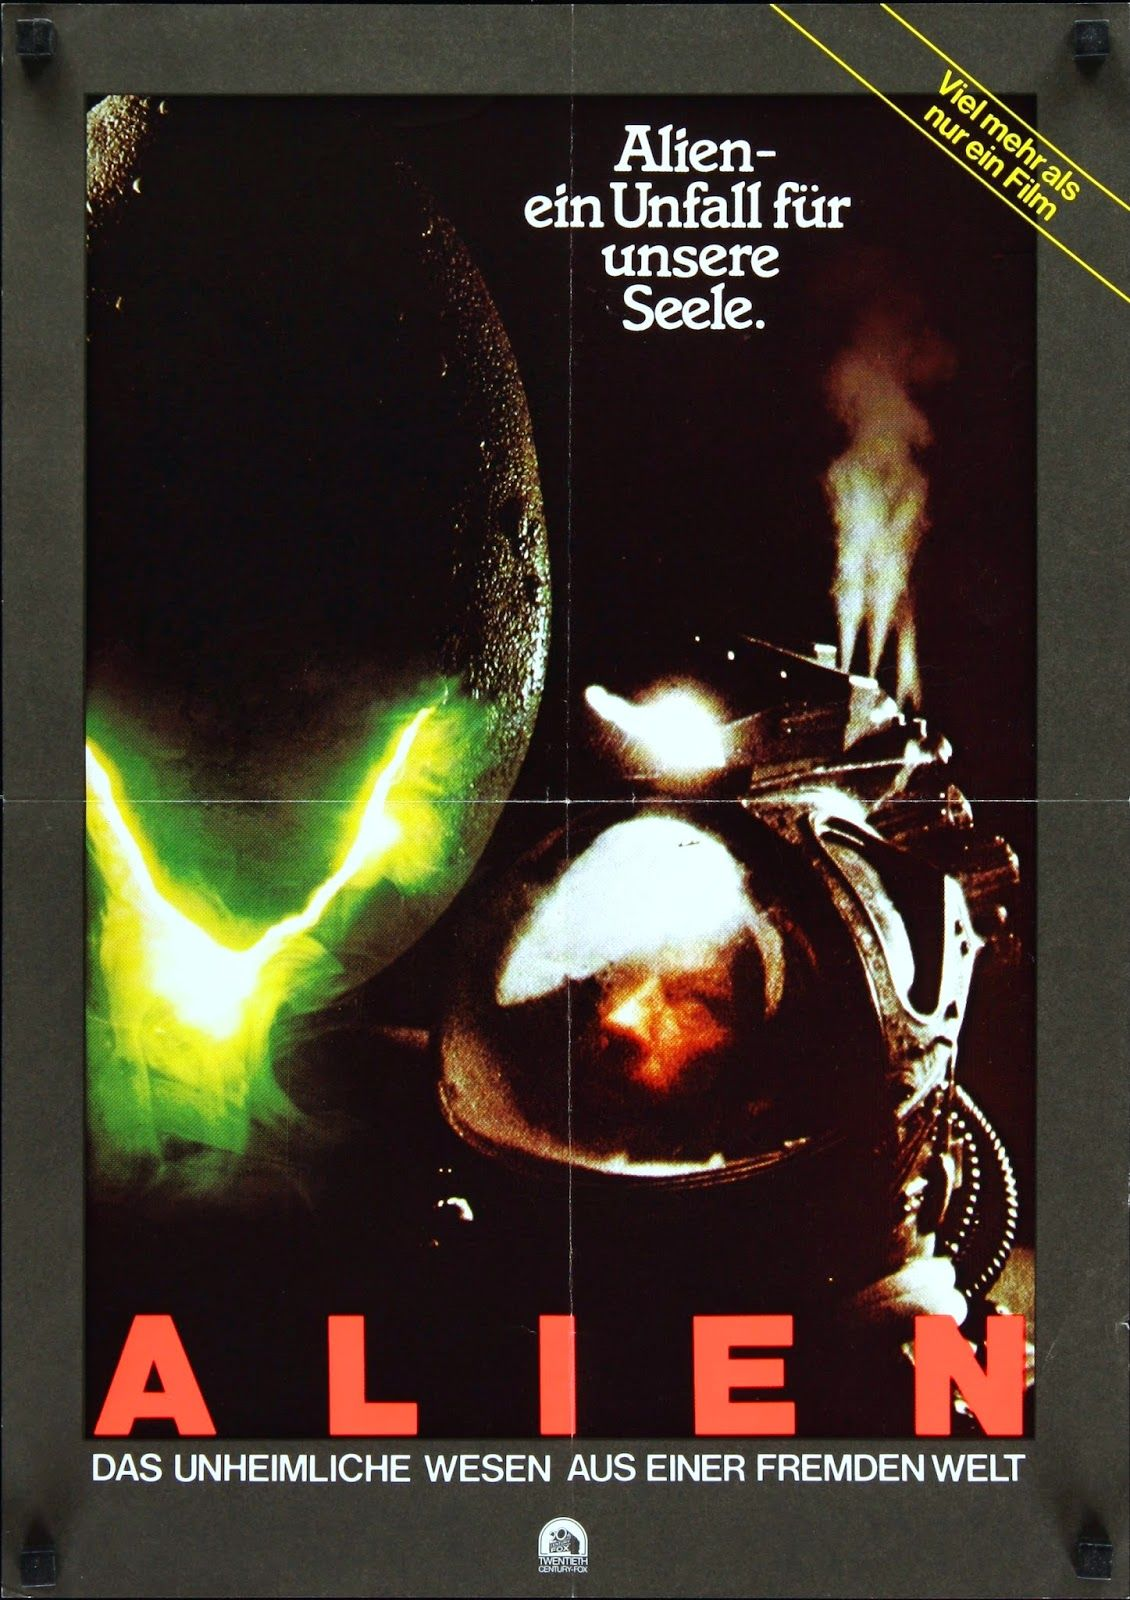 alien movie poster original - photo #37